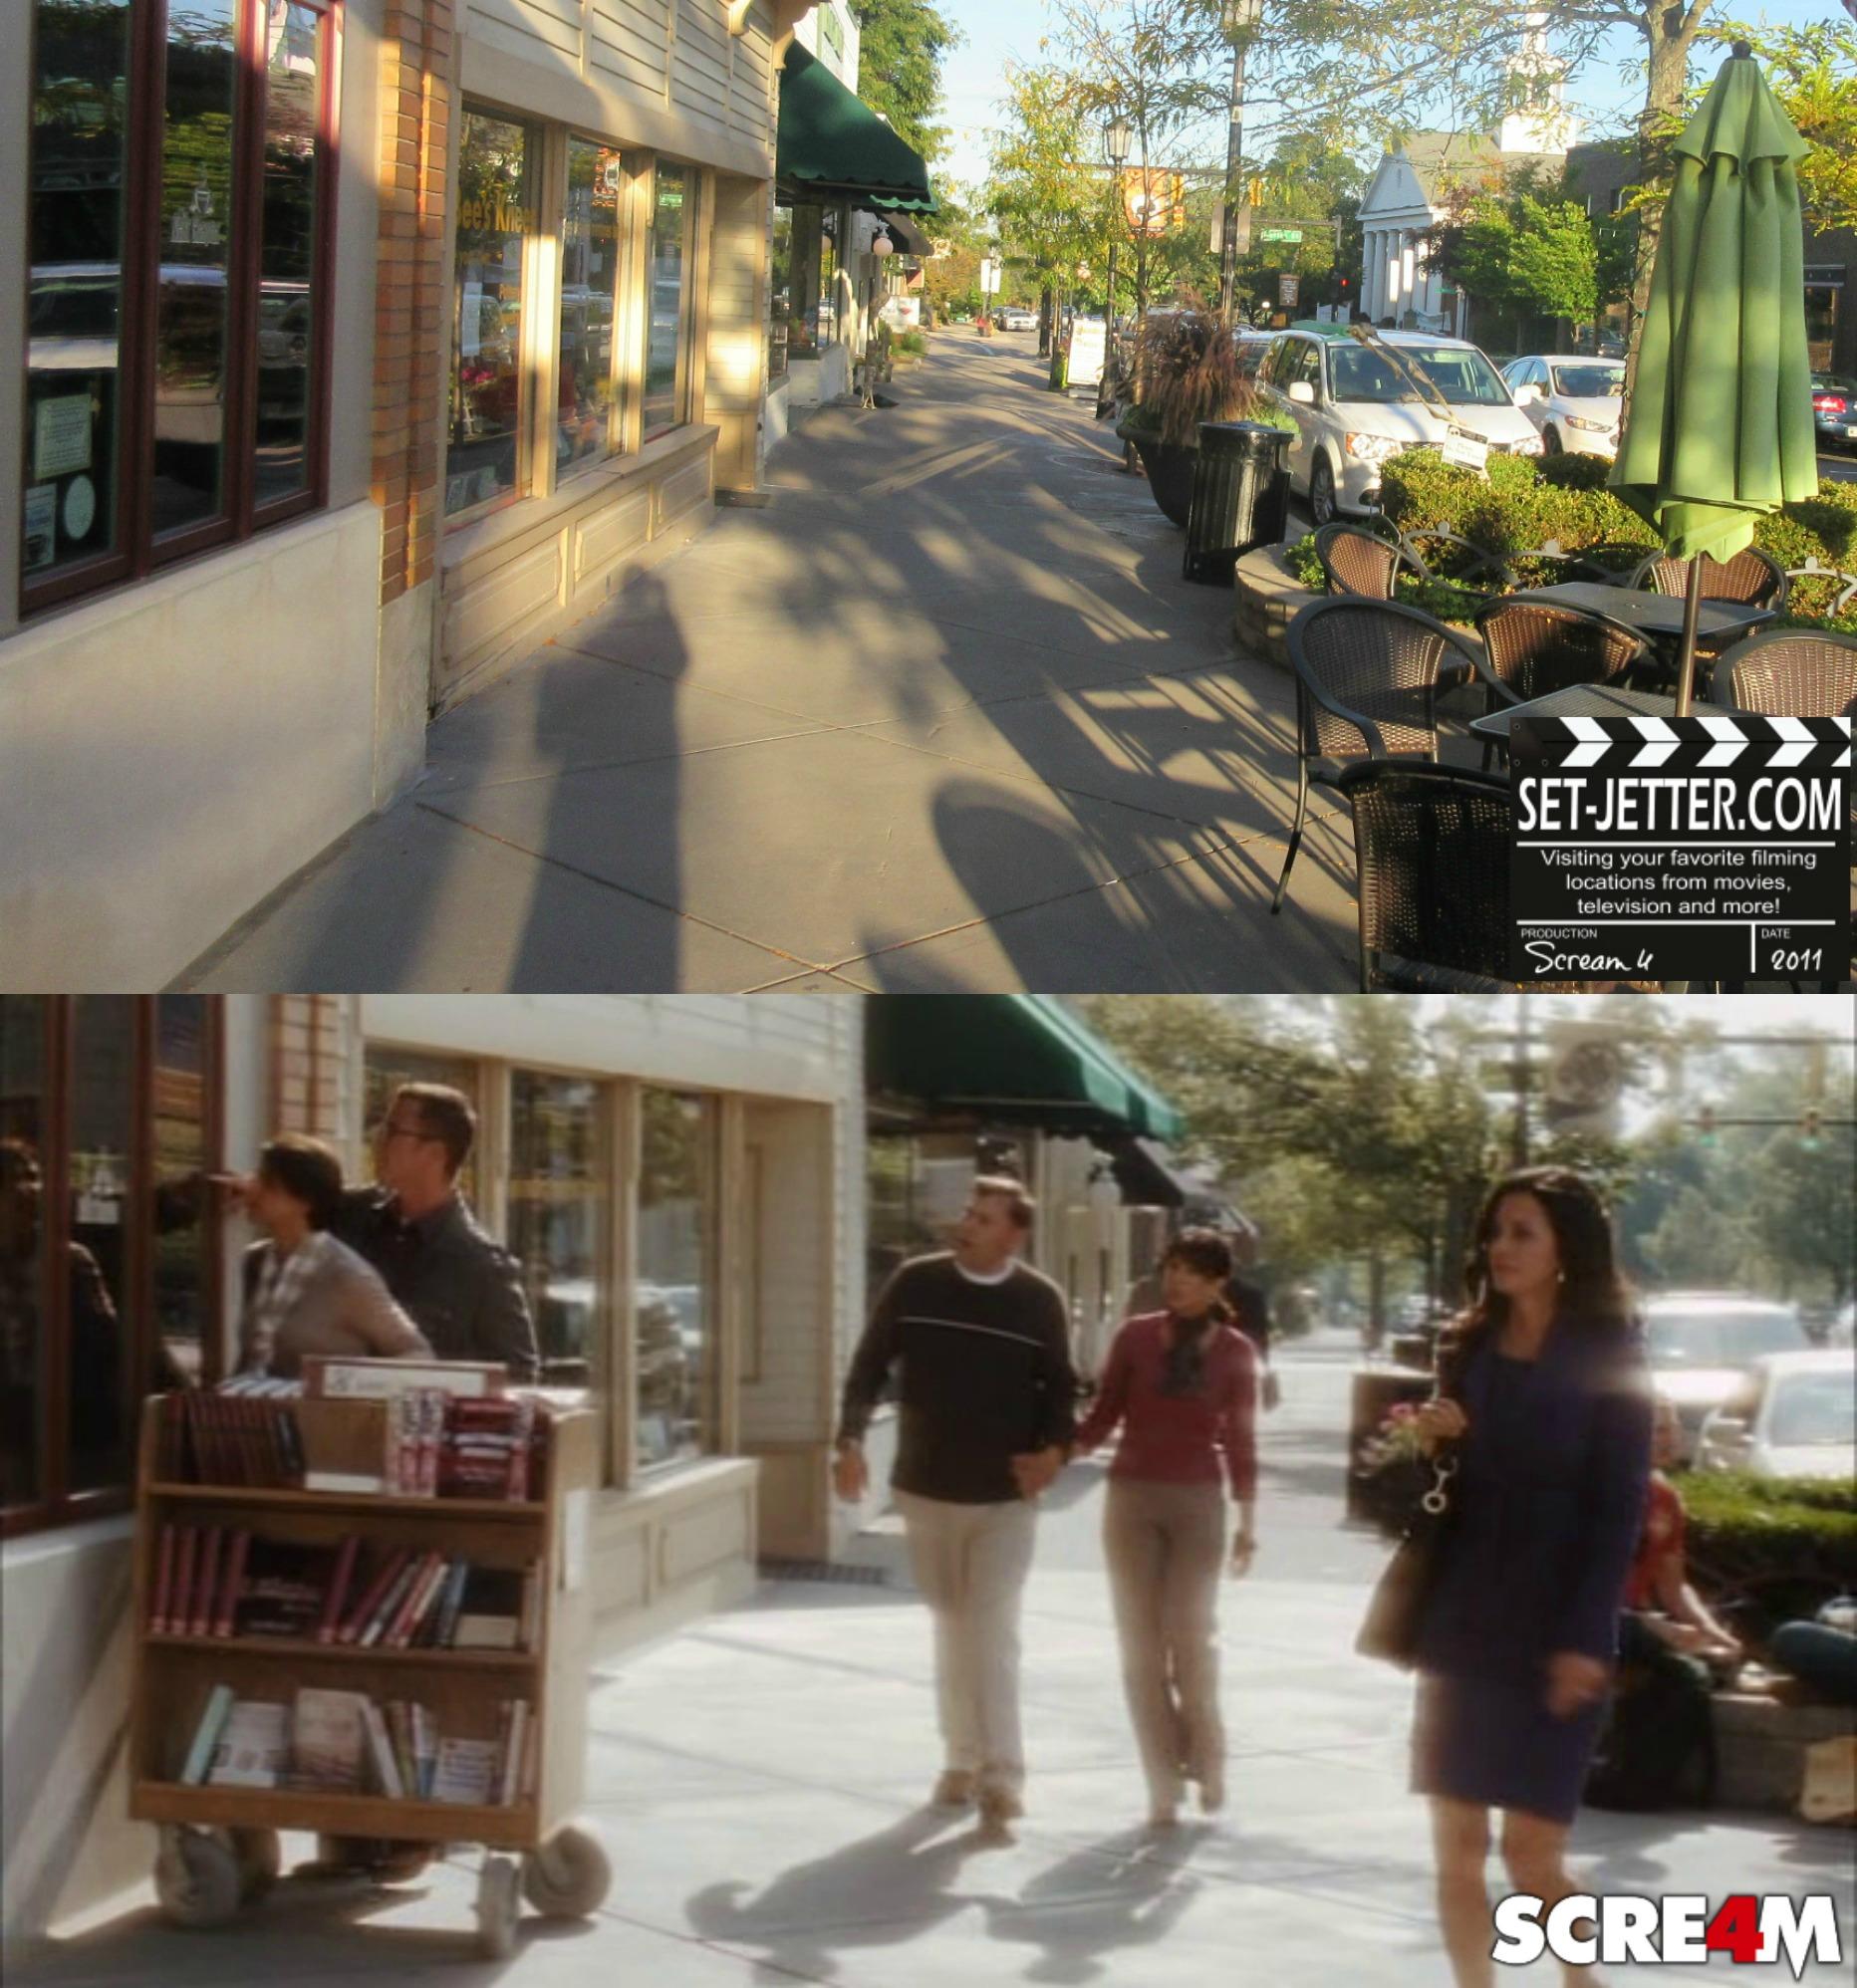 Scream4 comparison 71.jpg